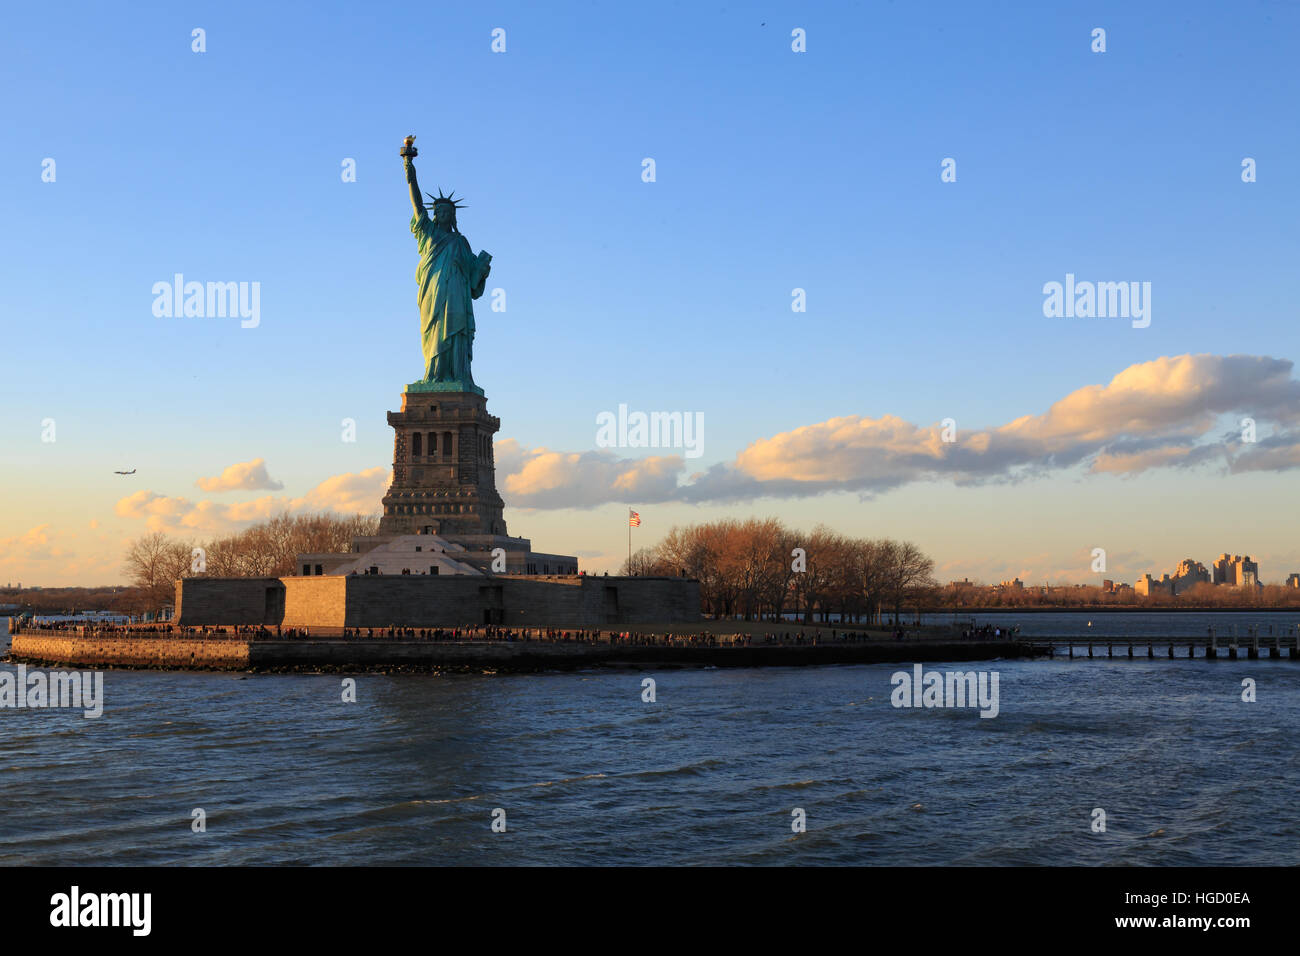 Statue of liberty new york city. - Stock Image